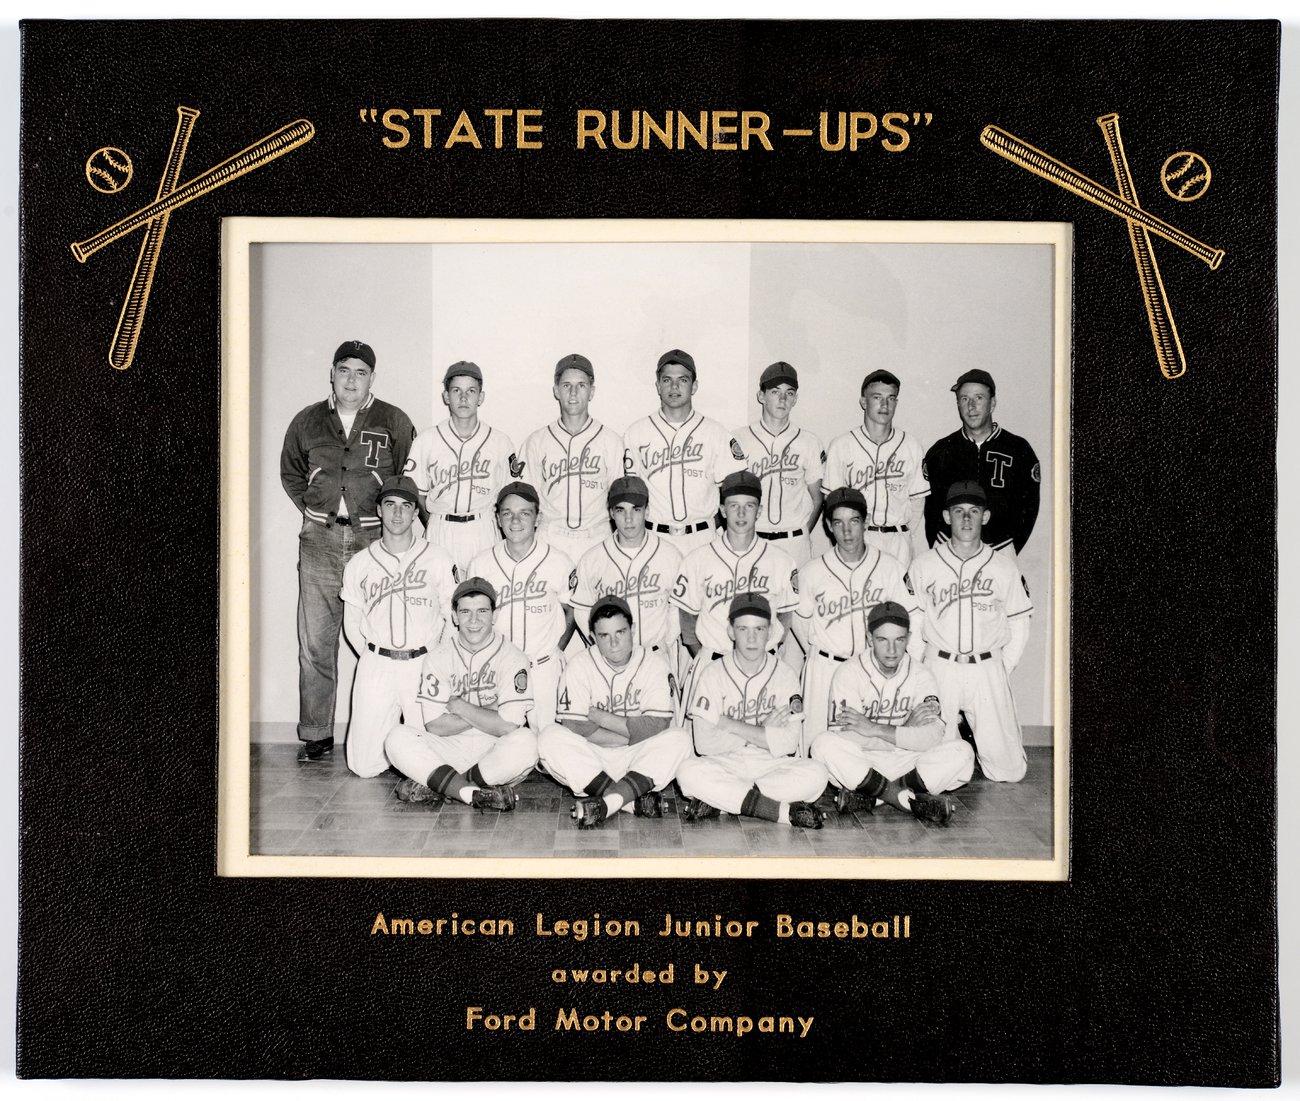 Mosby-Mack baseball team in Topeka, Kansas - 1